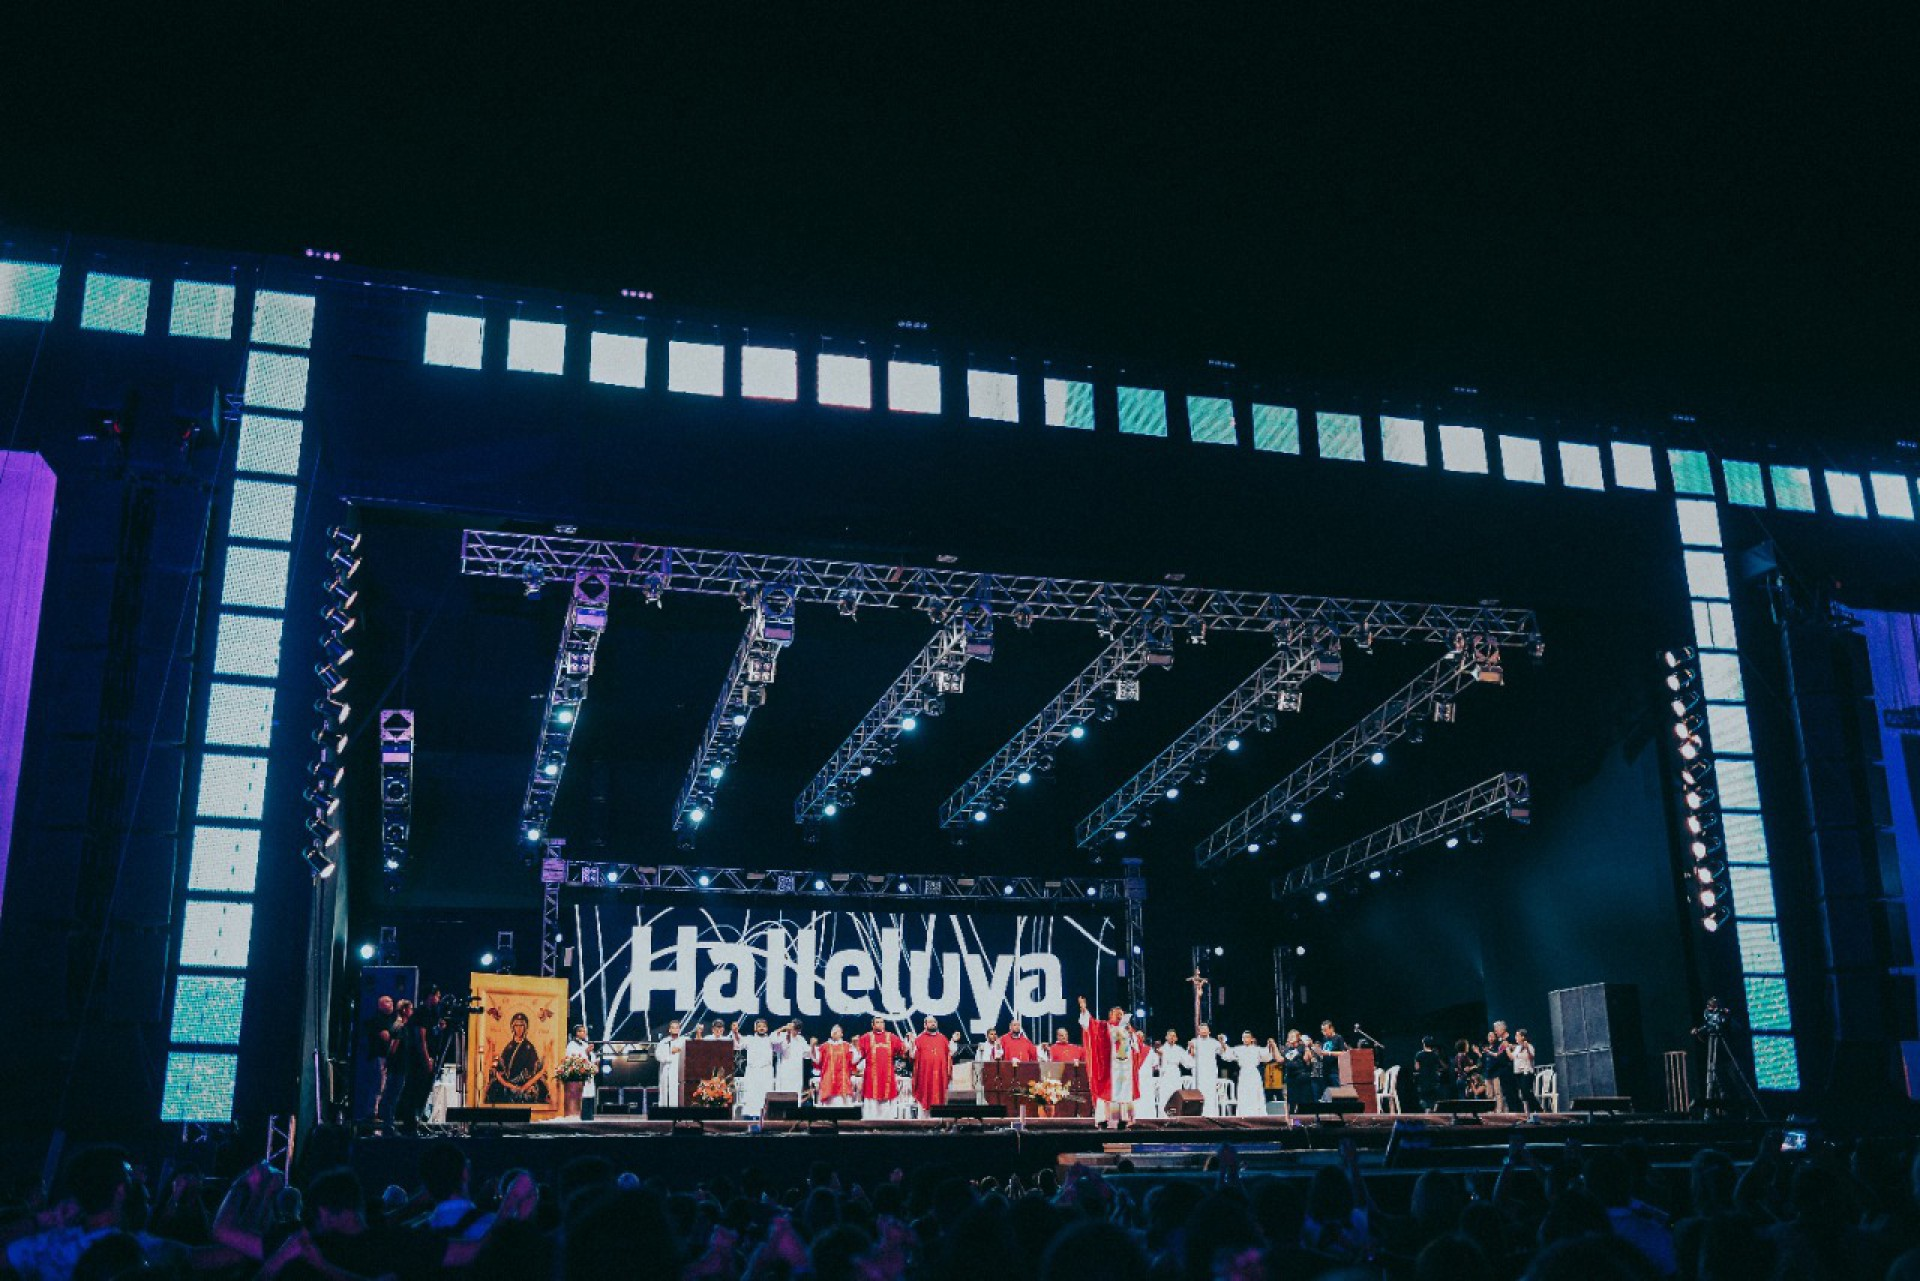 Festival Halleluya